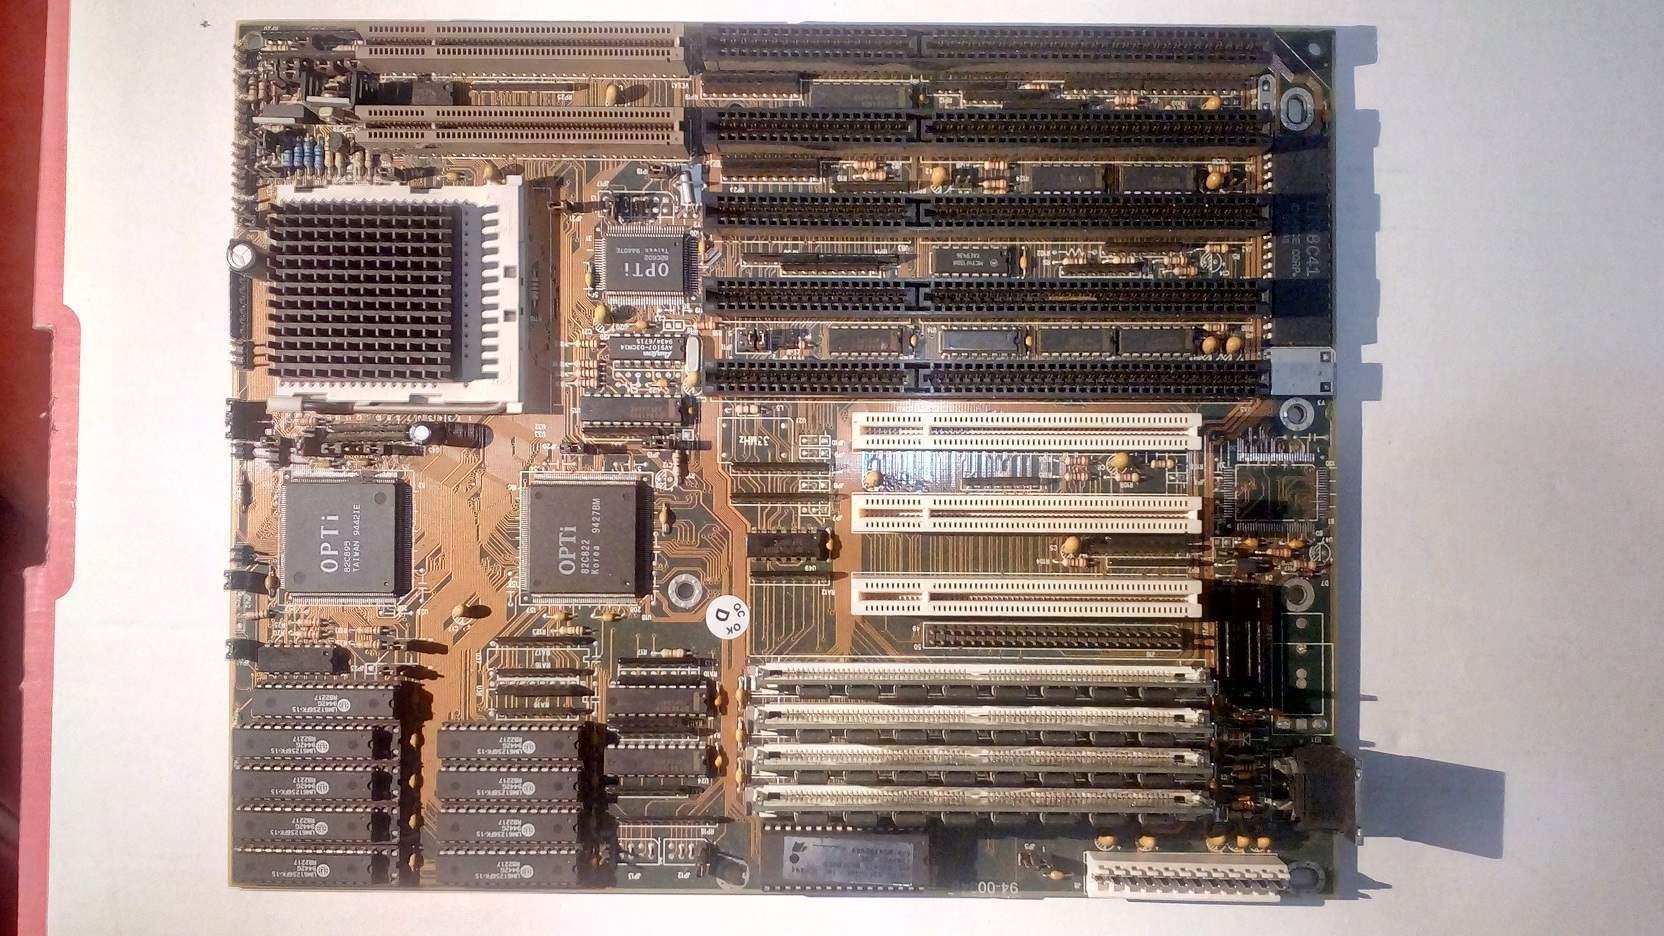 486 VLB/PCI